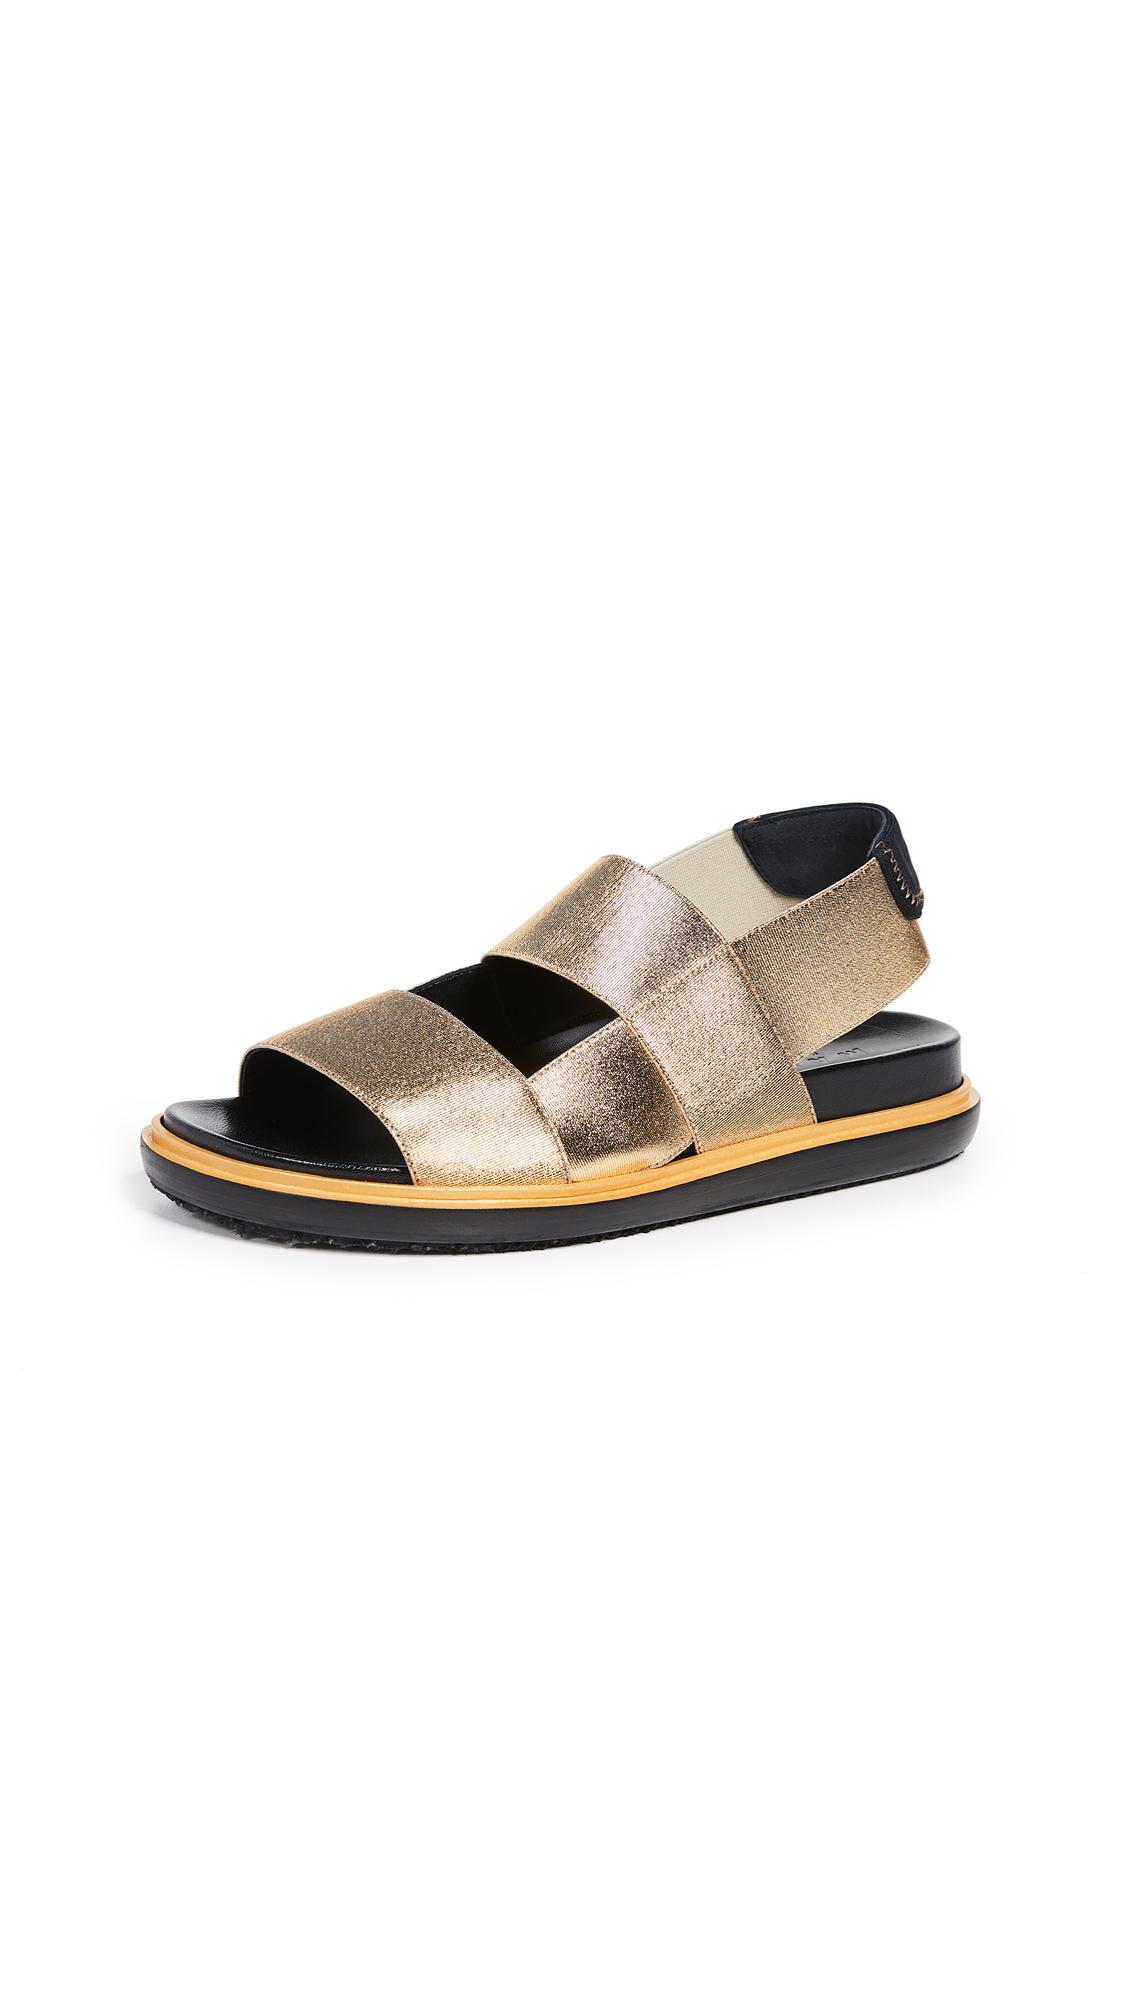 Marni Fussbett Sandals - Gold Sand